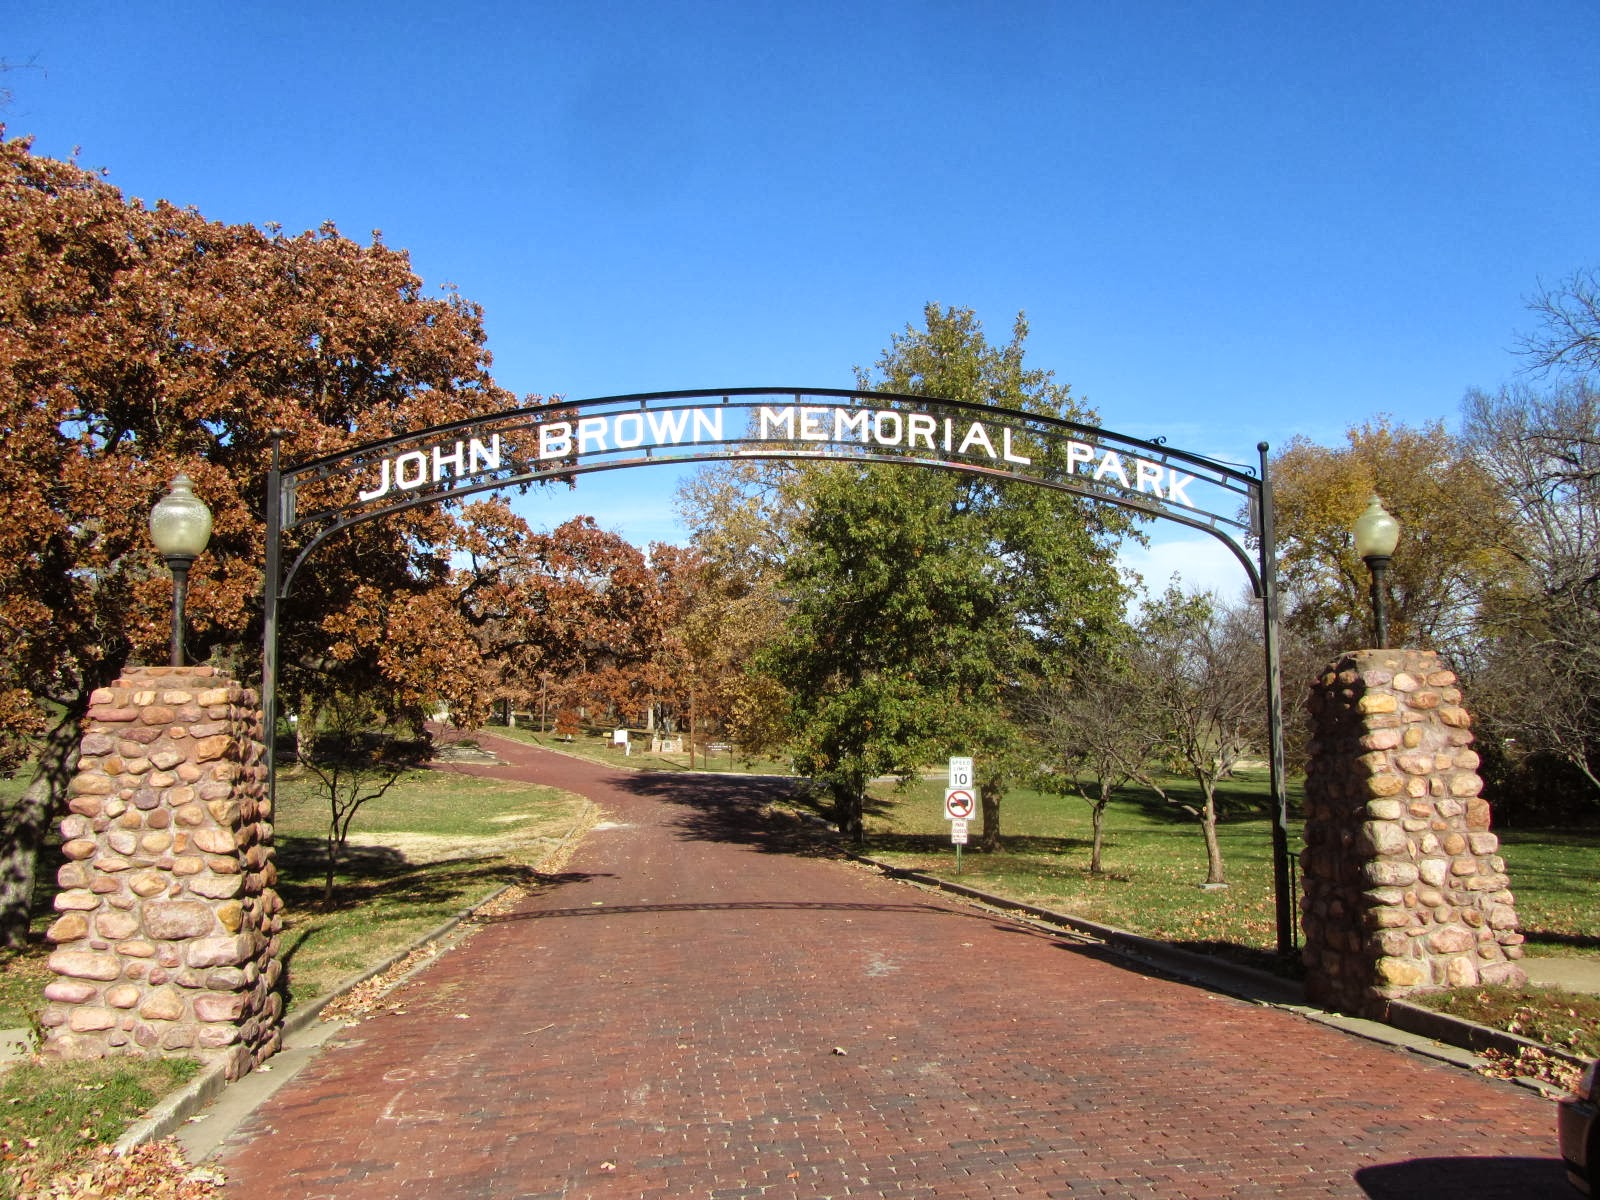 autoliterate: Bleeding Kansas: John Brown country